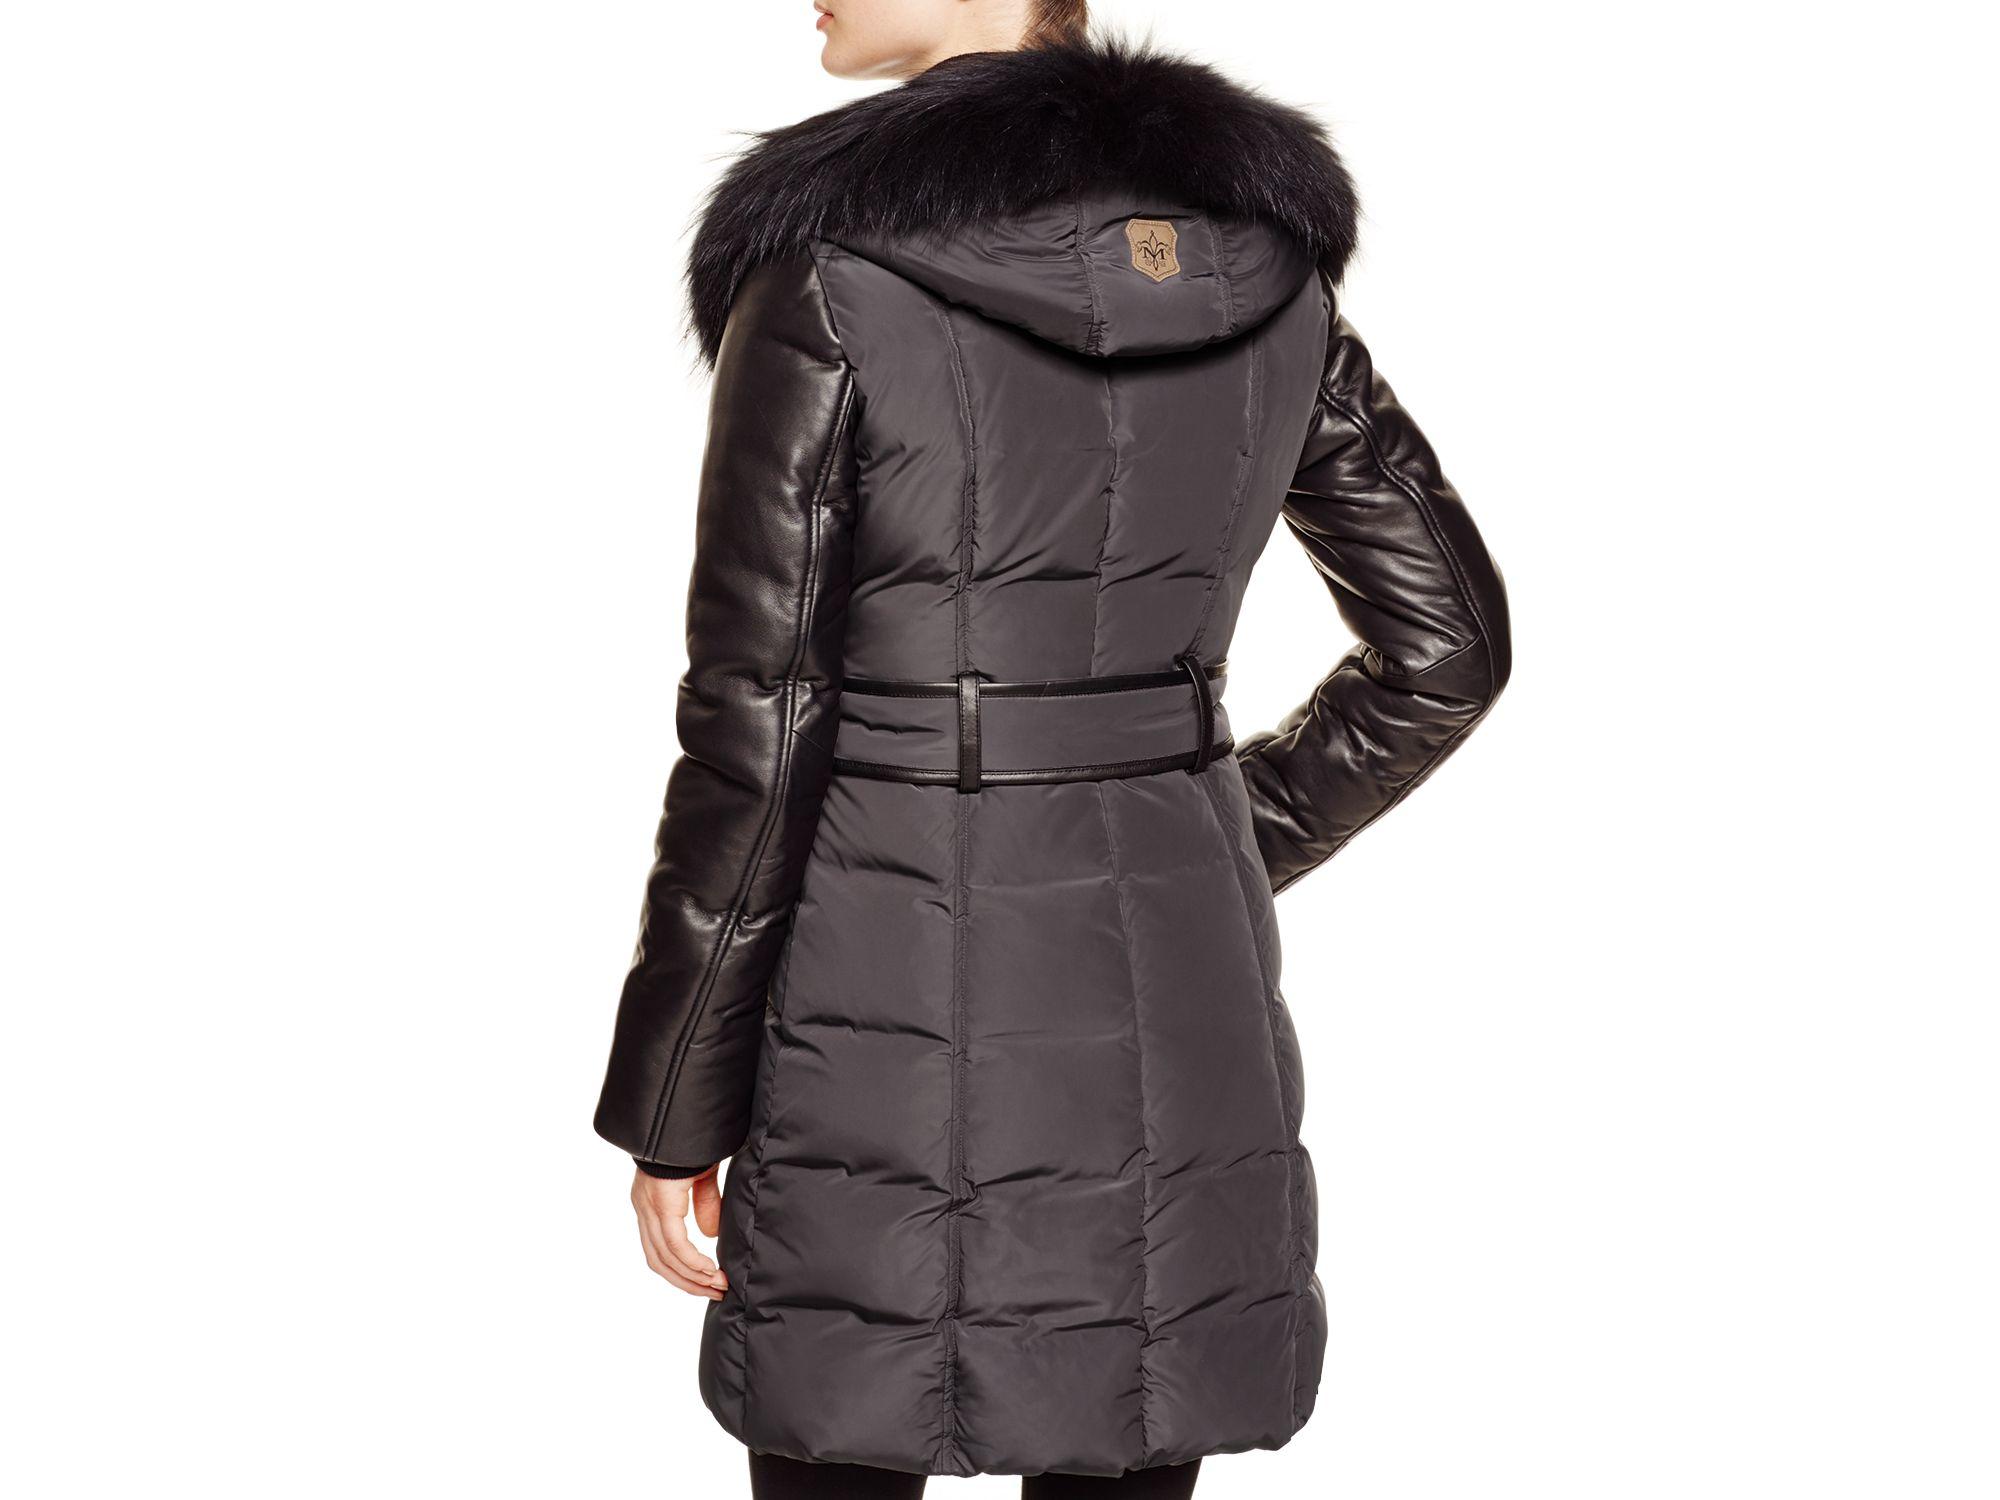 inexpensive mackage coats bloomingdales employment d0f7e 98880